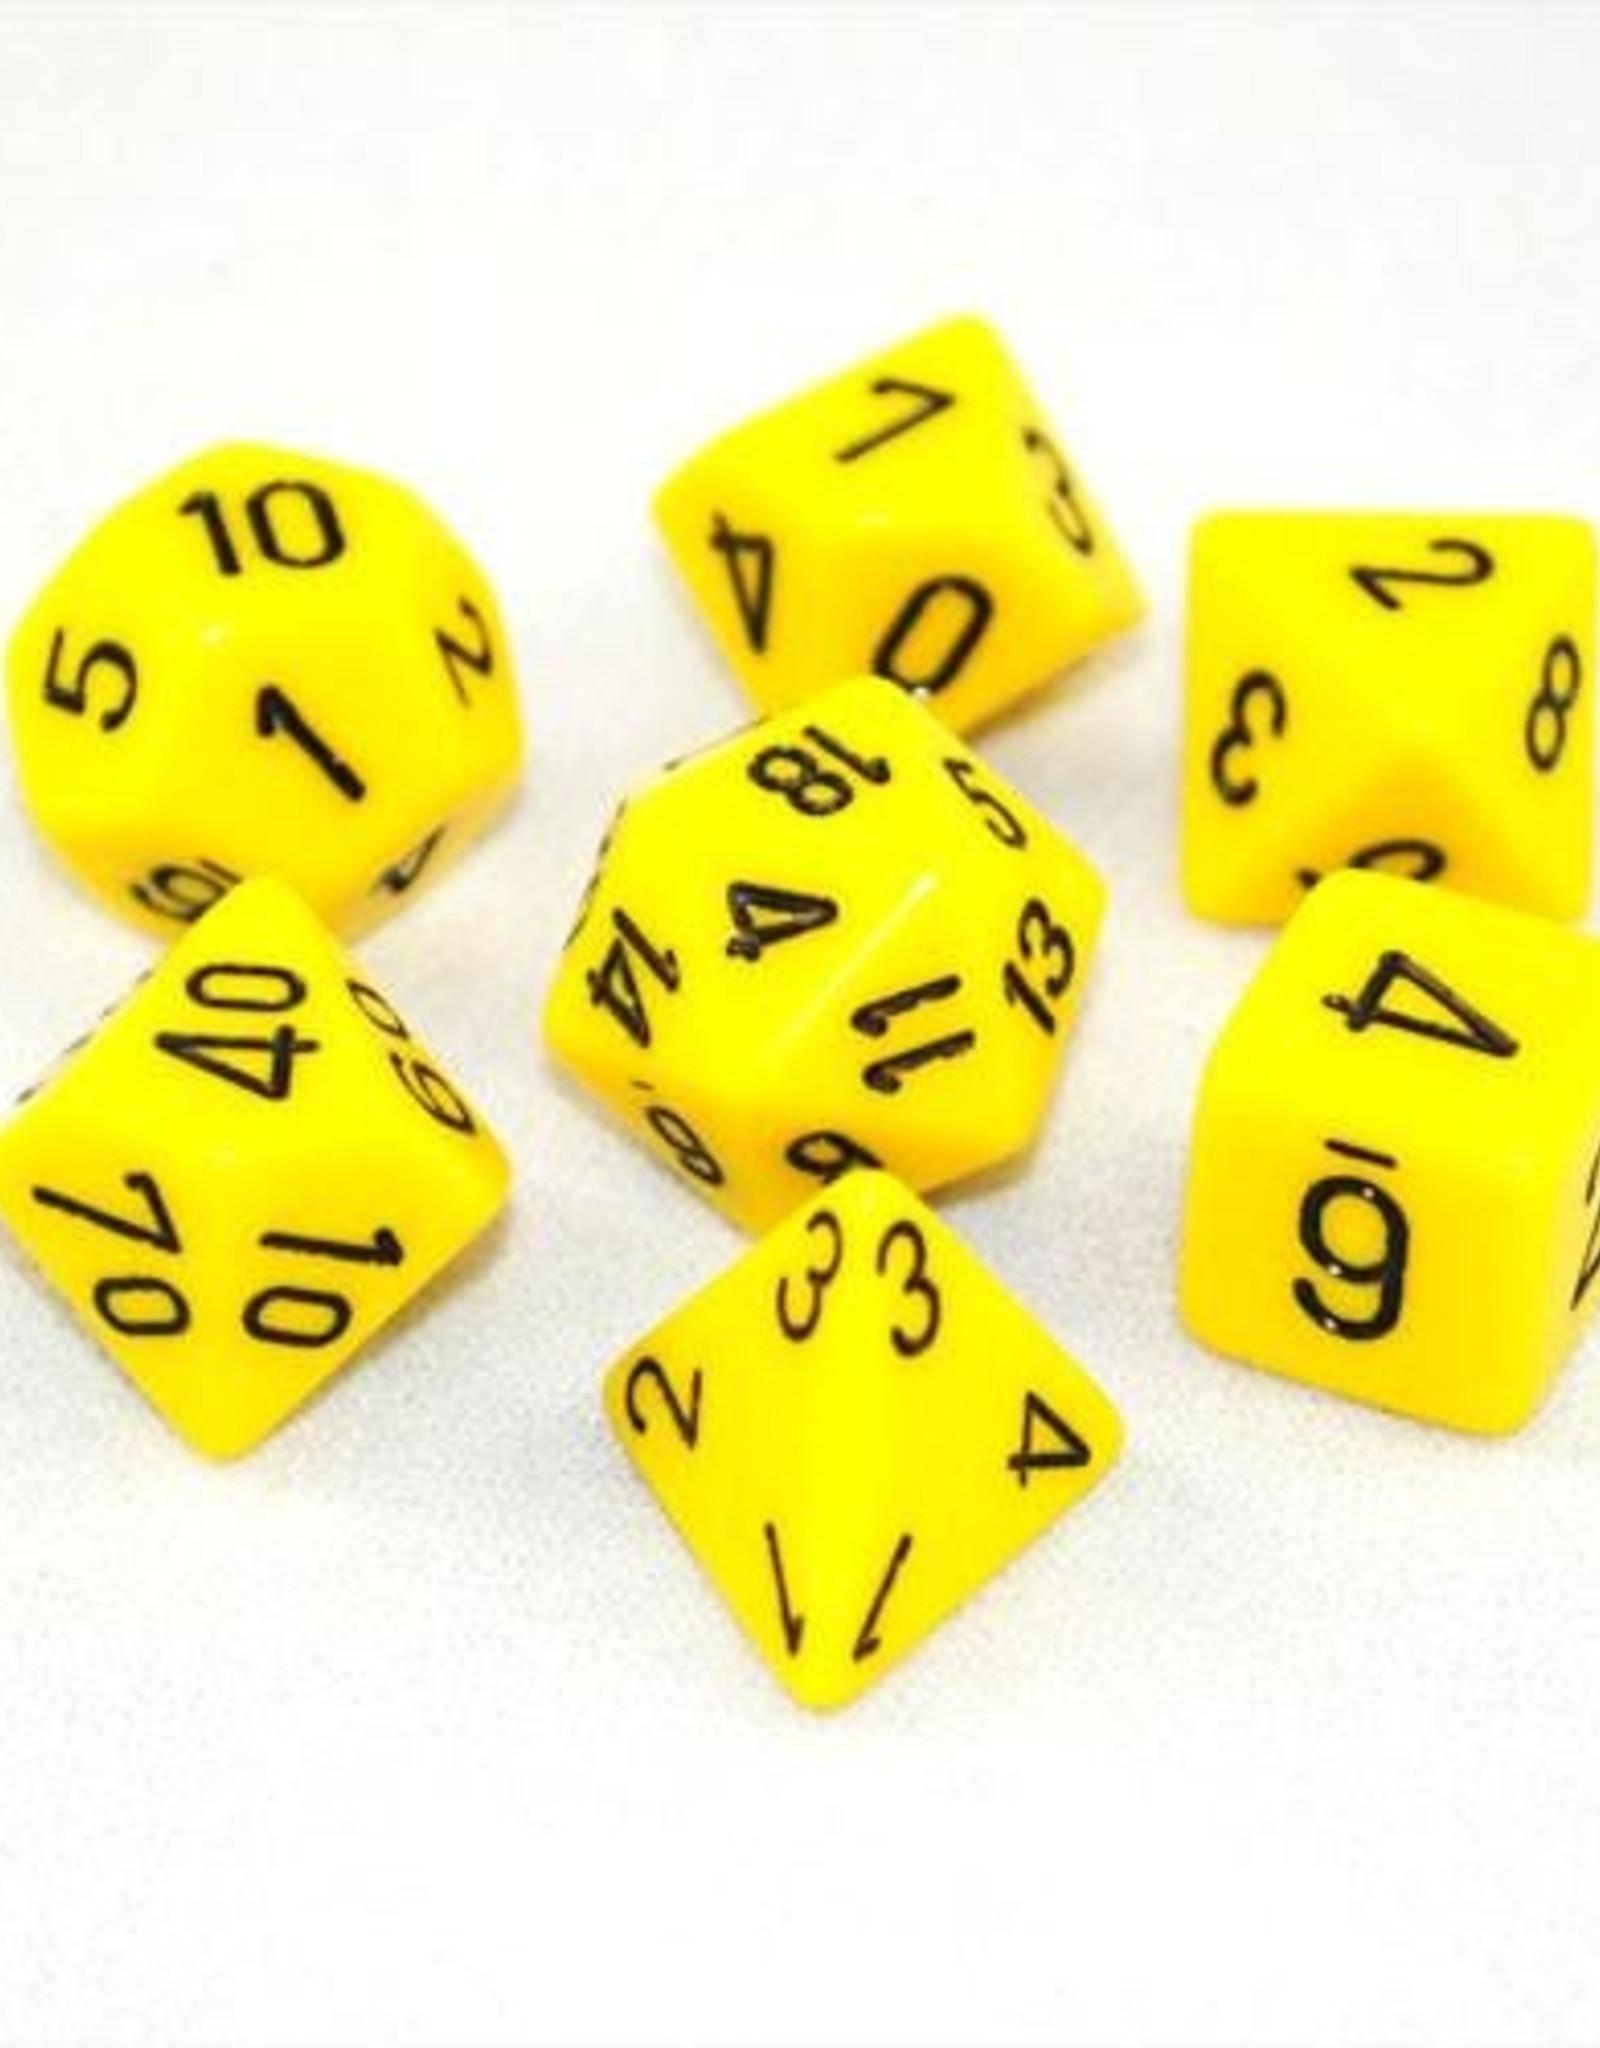 Chessex Chessex 7-Die set Opaque - Yellow/Black